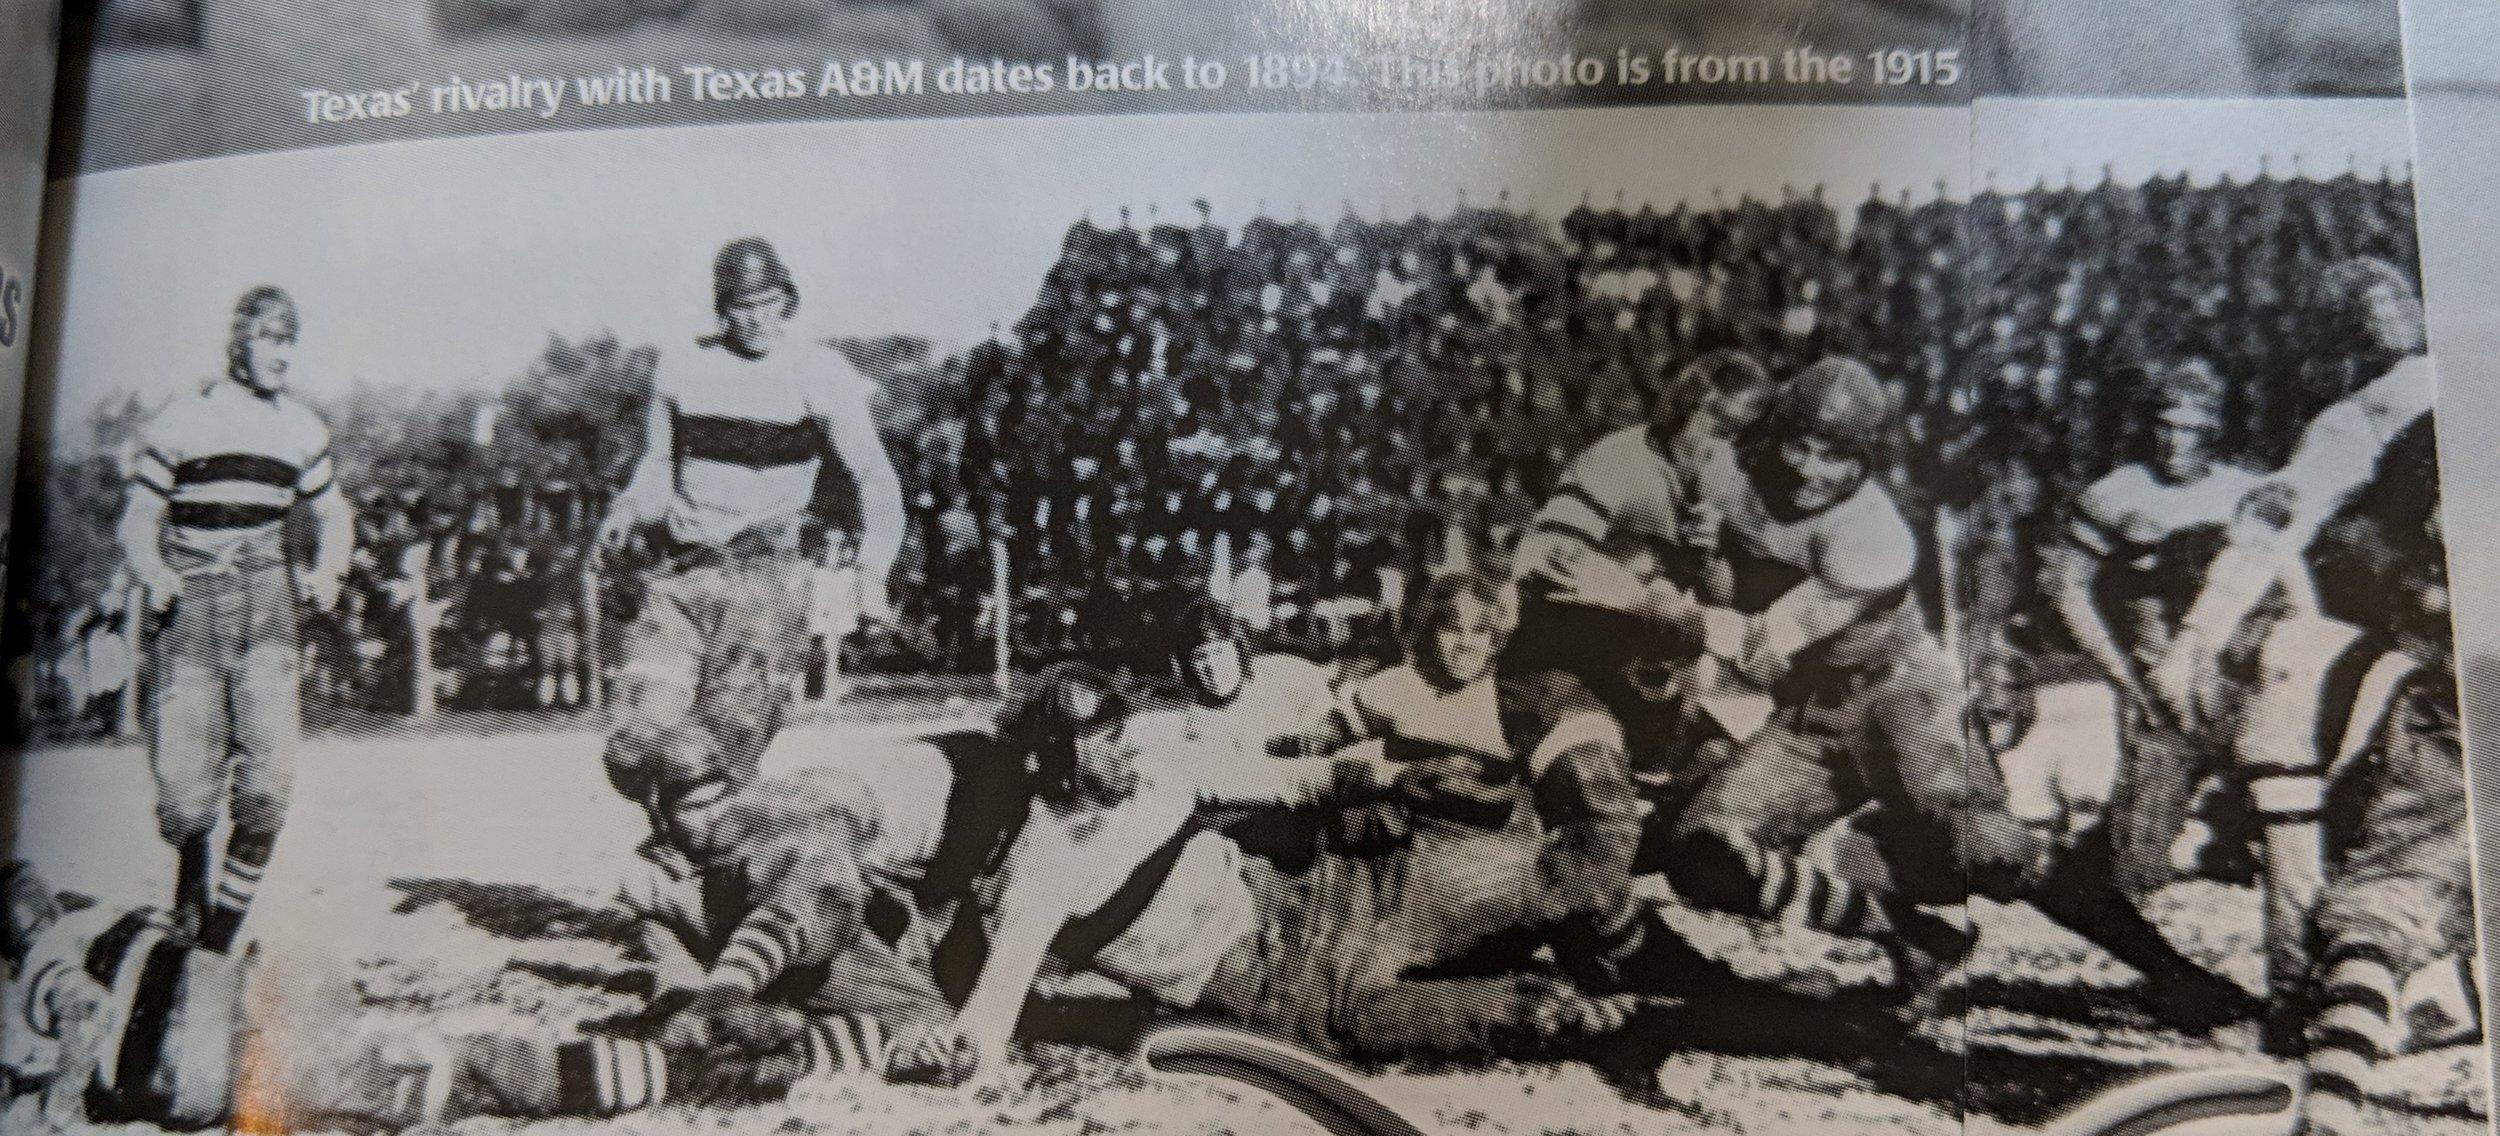 Texas vs. A & M